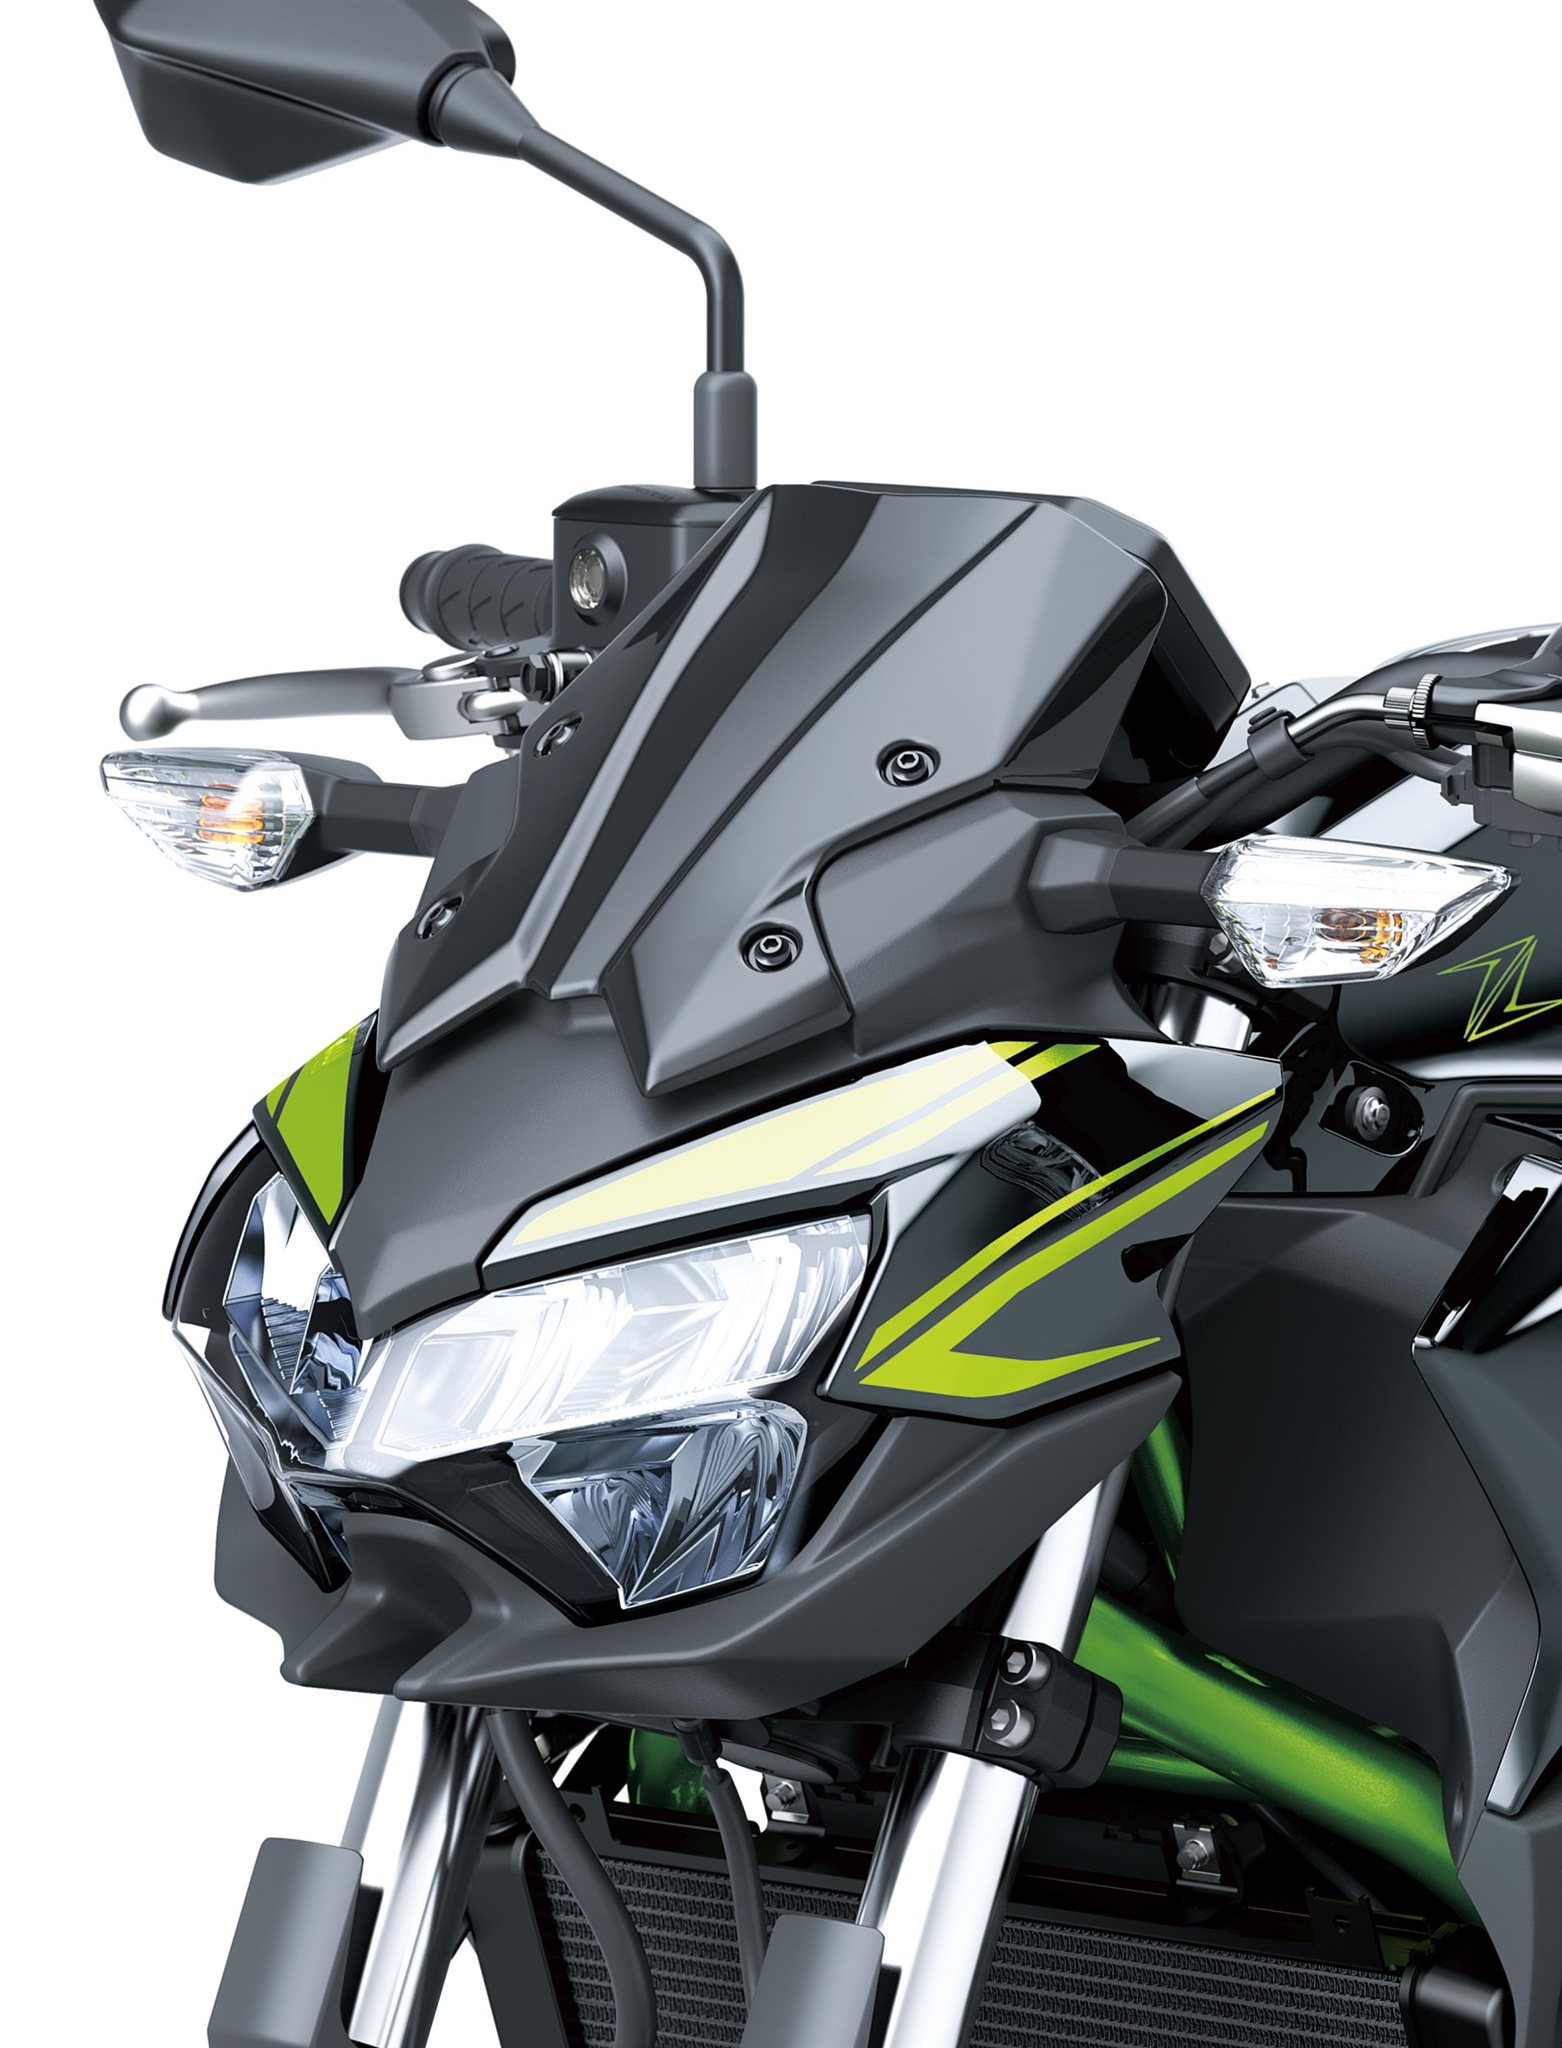 Kawasaki ER-6n - Alle technischen Daten zum Modell ER-6n